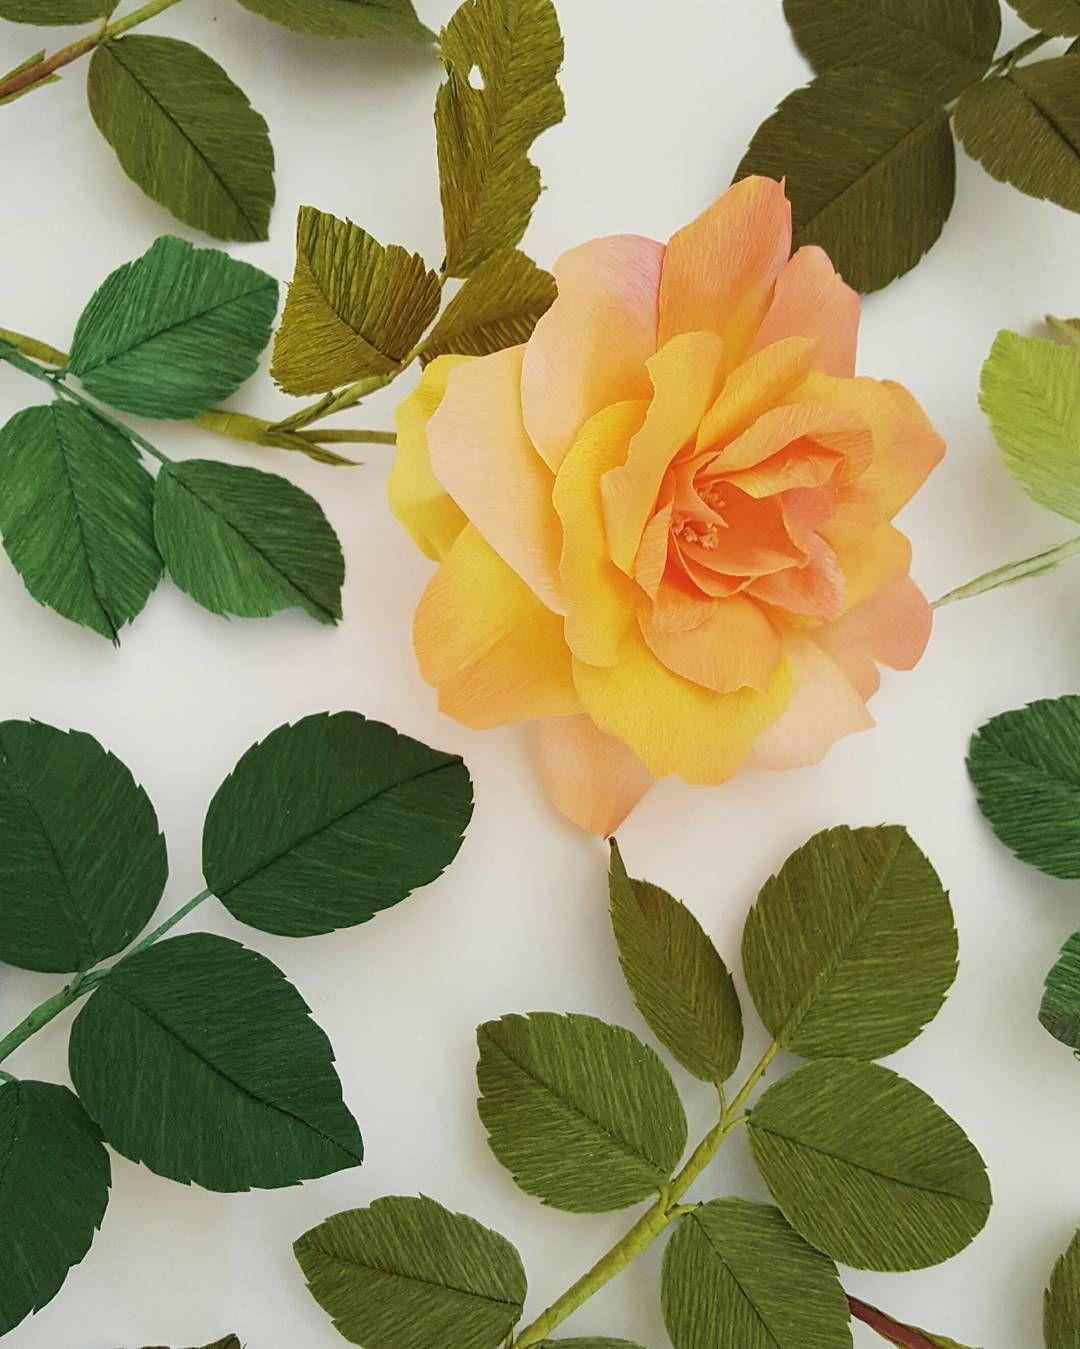 Crepe paper josephus coat rose in progress by lynn dolan flores